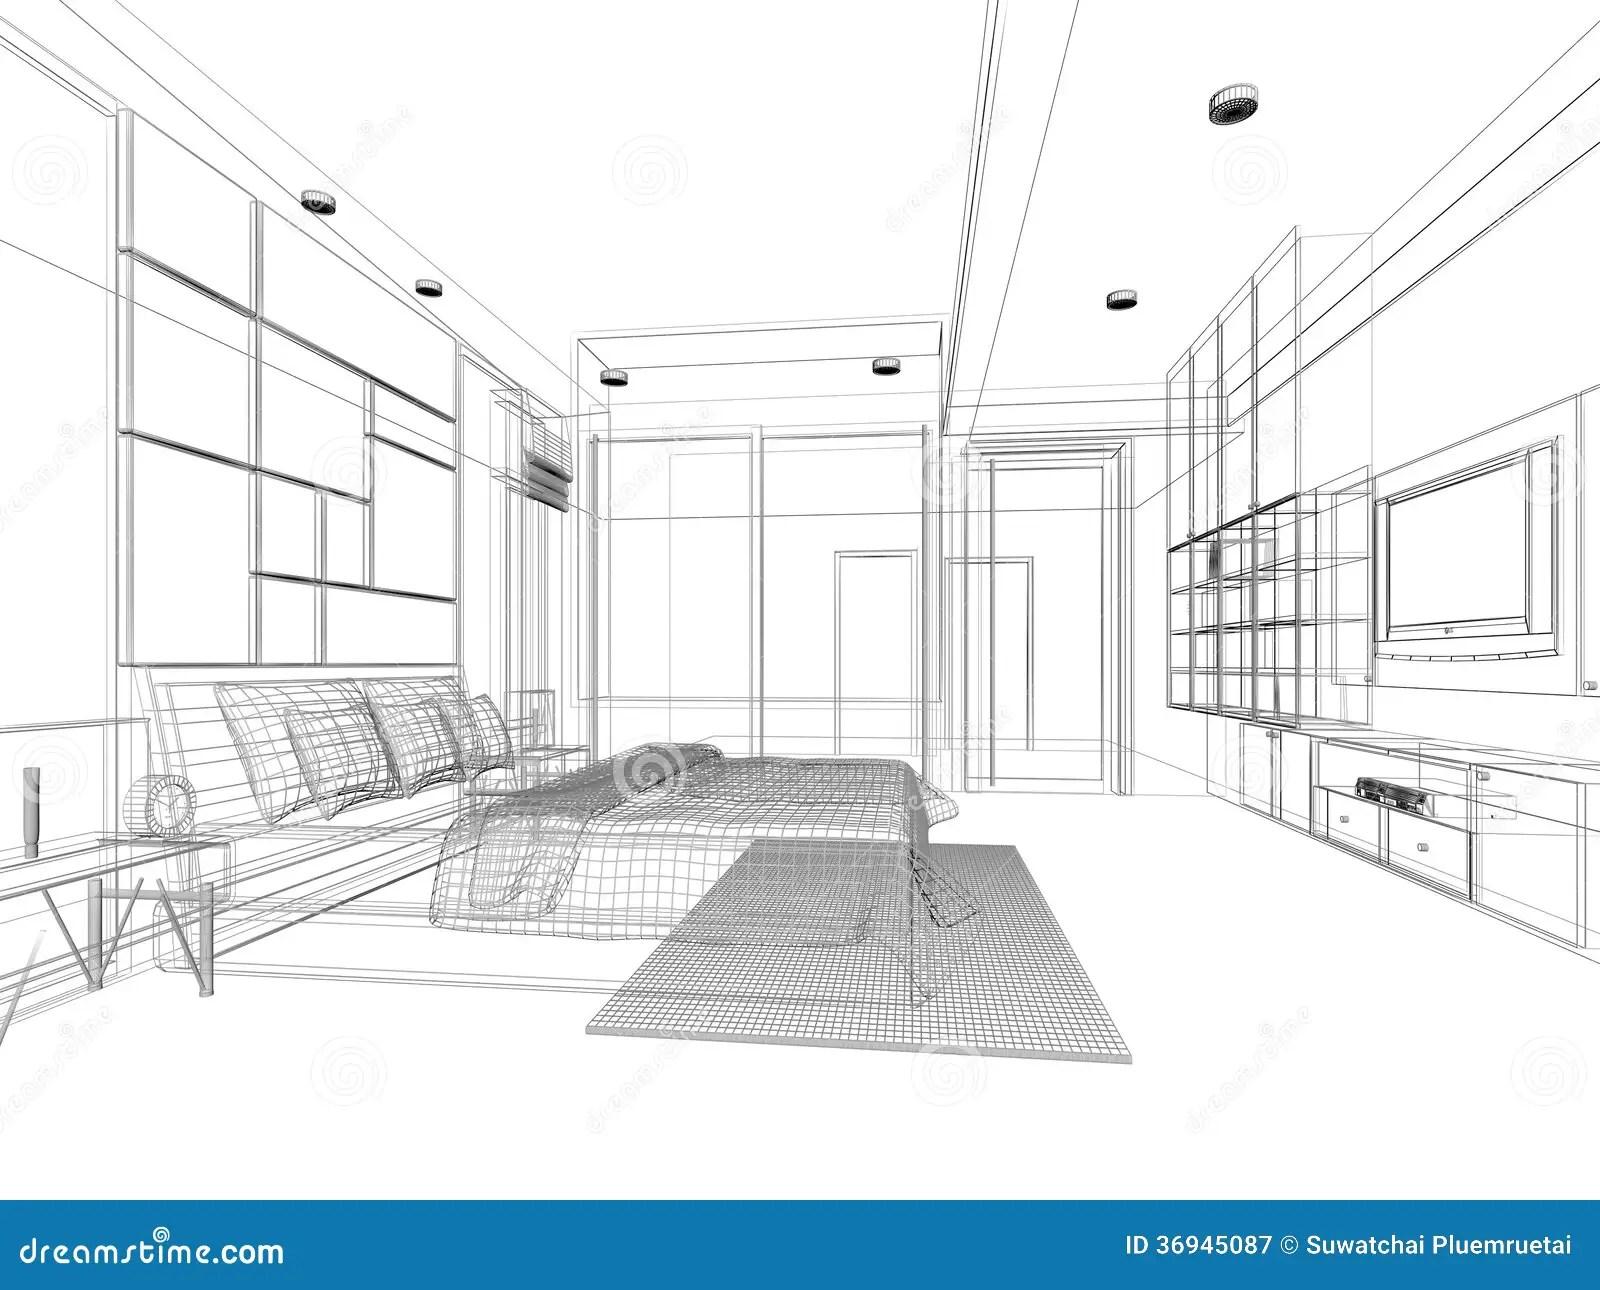 Sketch design of bedroom stock illustration. Illustration